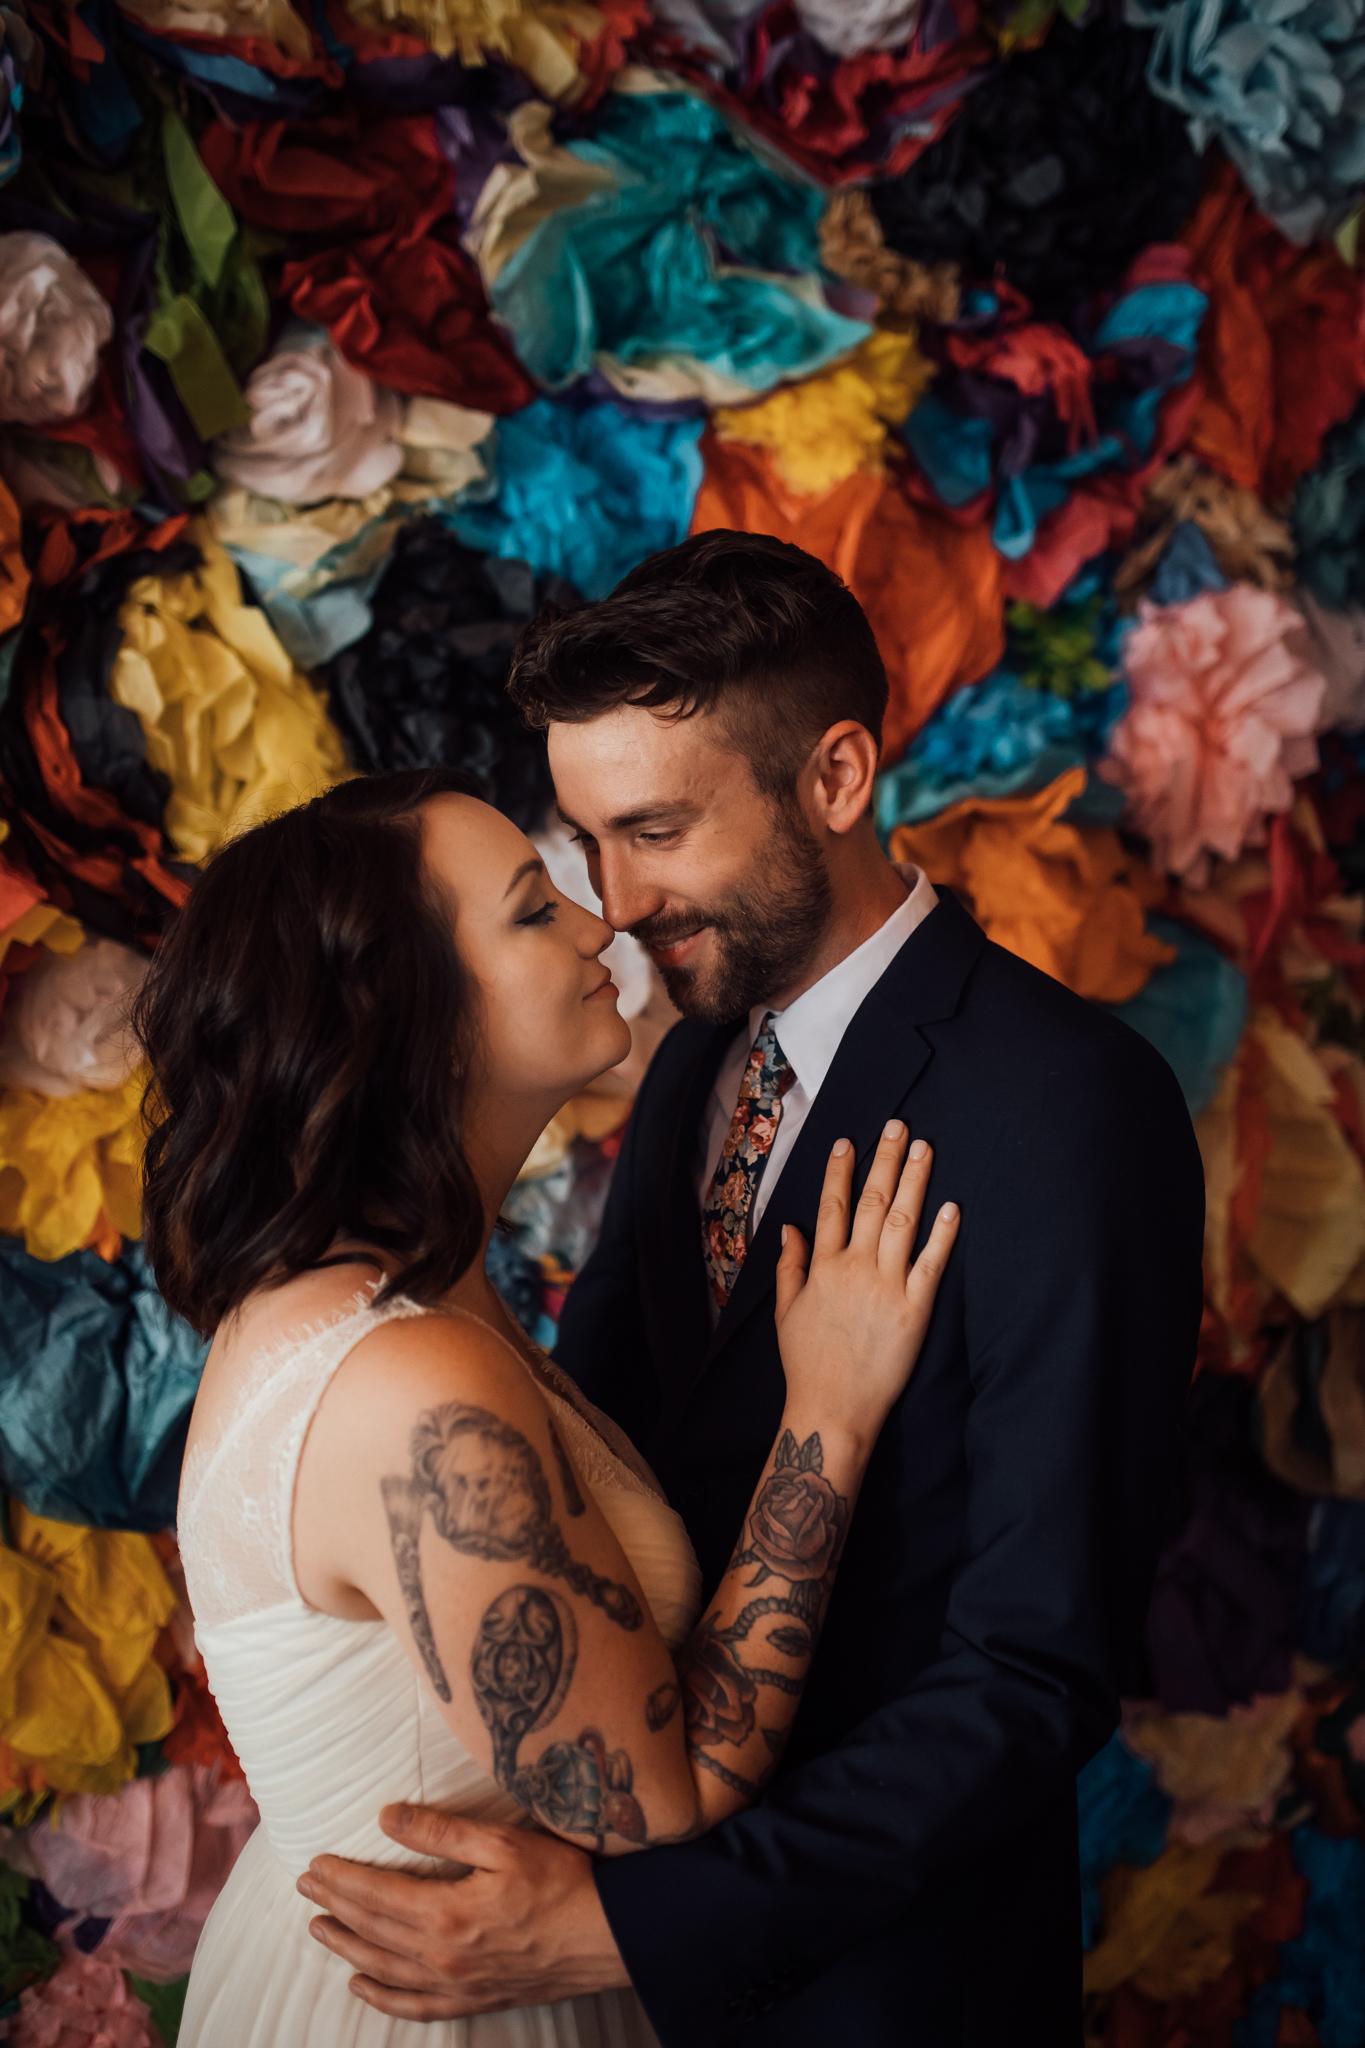 thewarmtharoundyou-amurica-studio-wedding-colorful-unique-wedding (43 of 47).jpg